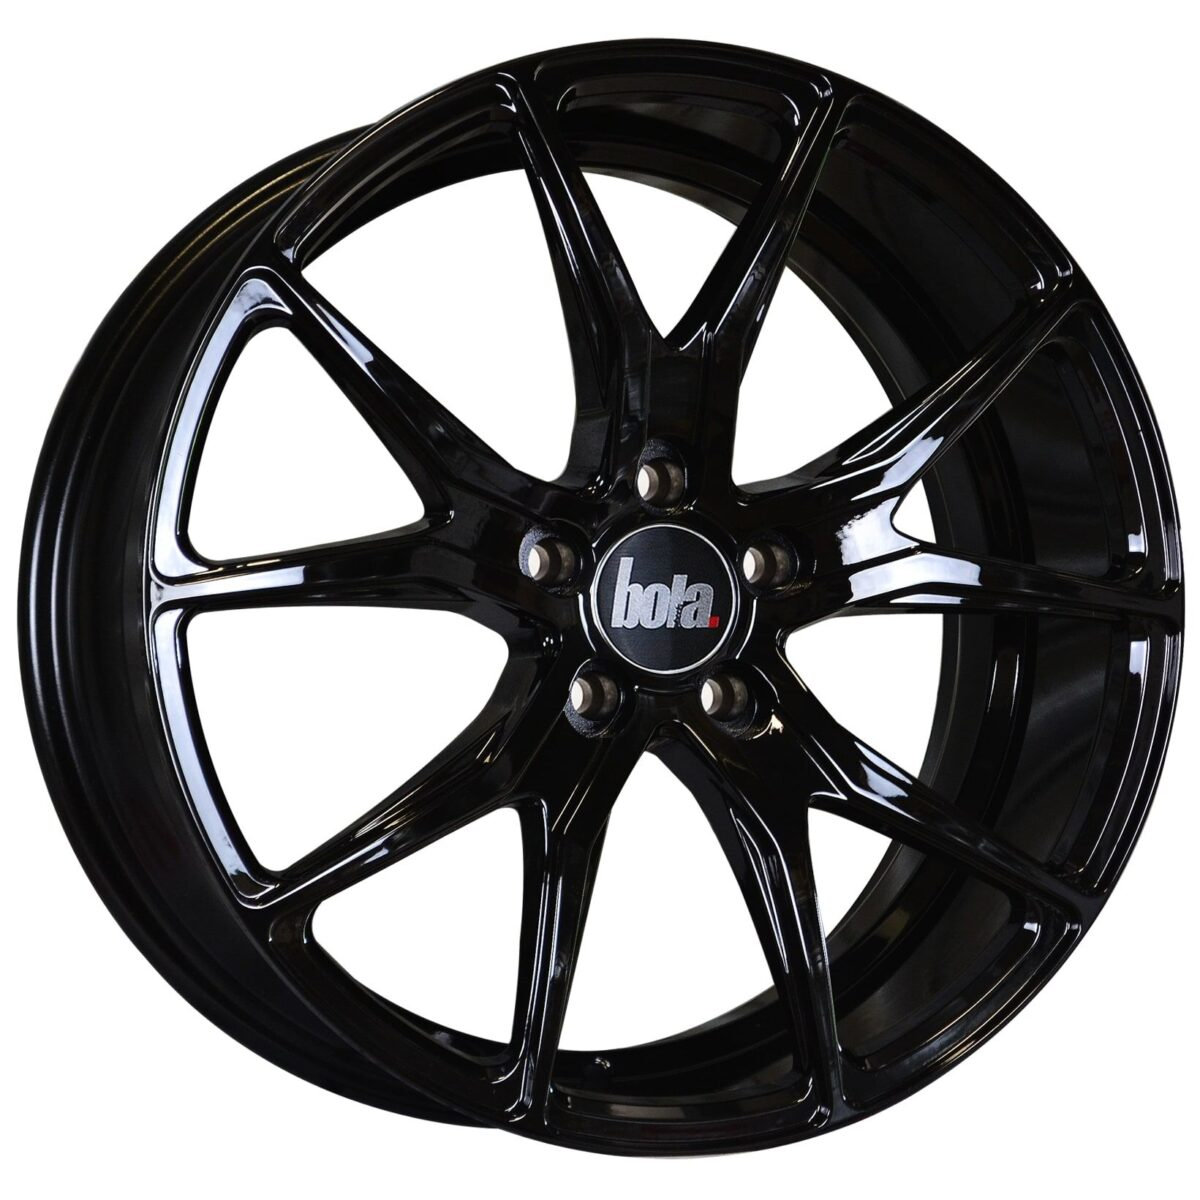 "18"" BOLA B6 Wheels - Gloss Black - All BMW Models"